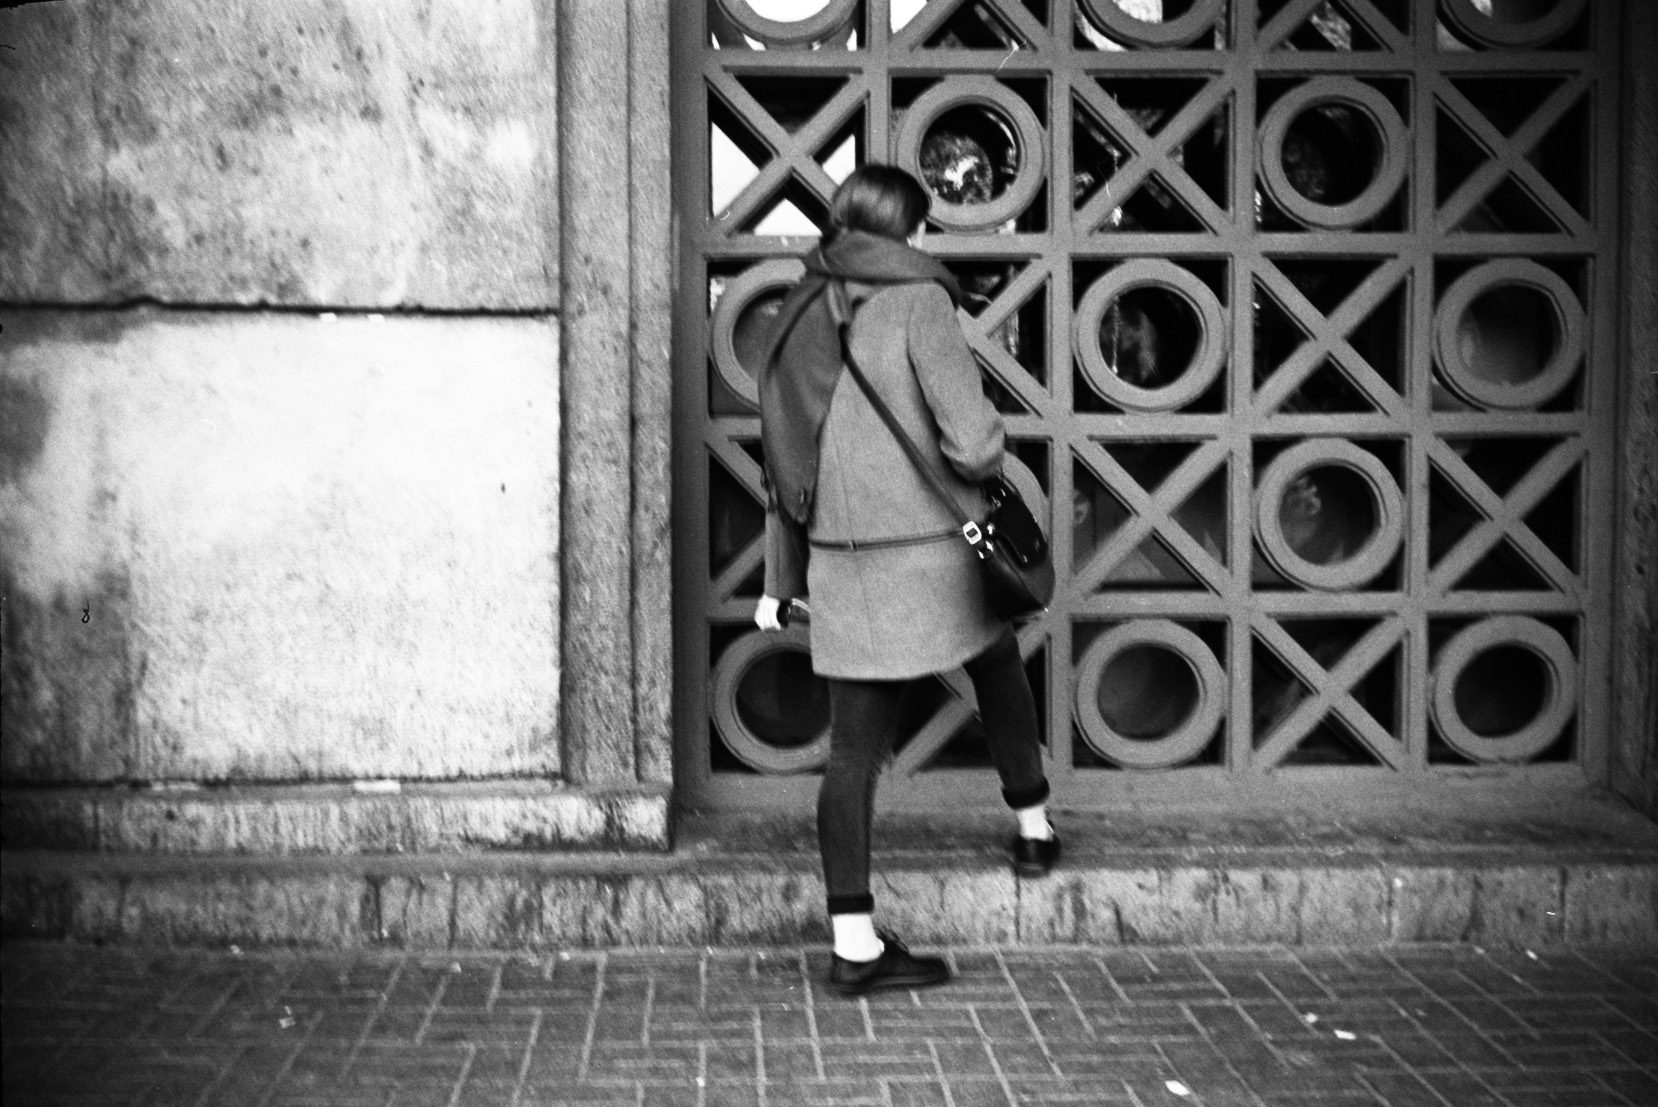 Smena F=40mm 1:4.5 1953, 35mm film photo camera